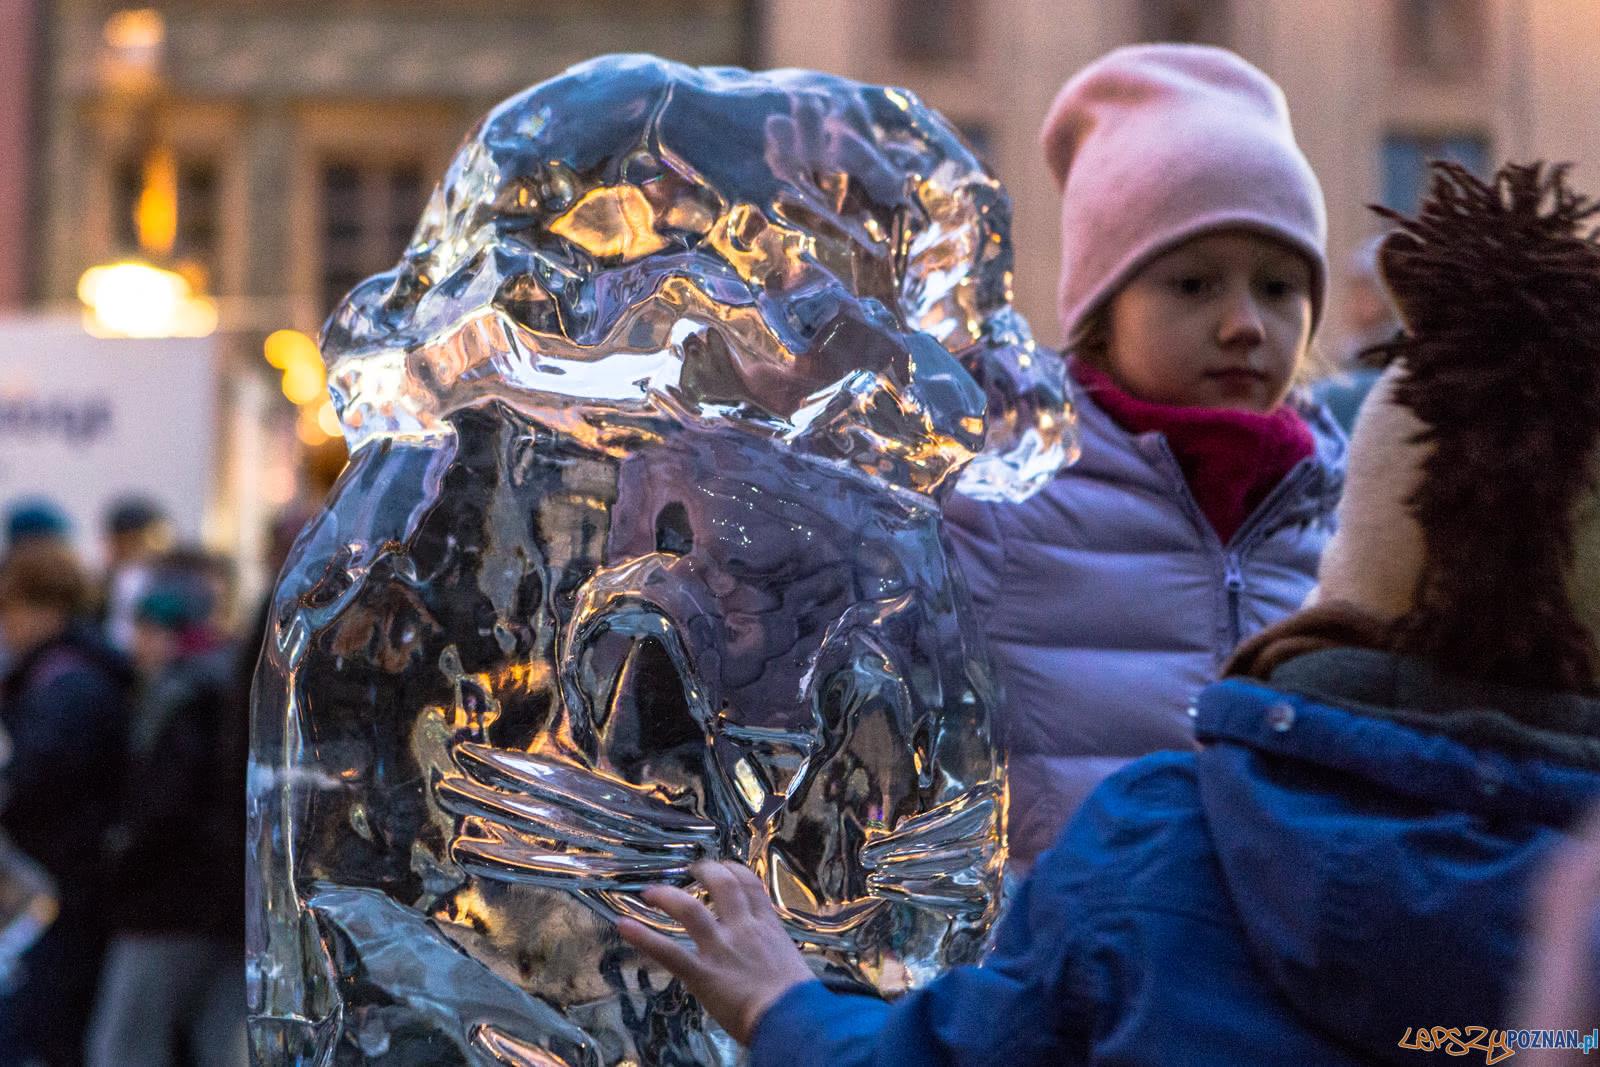 Poznan Ice Festival 2018 - Speed Ice Carving - Poznań 08.12.201  Foto: LepszyPOZNAN.pl / Paweł Rychter